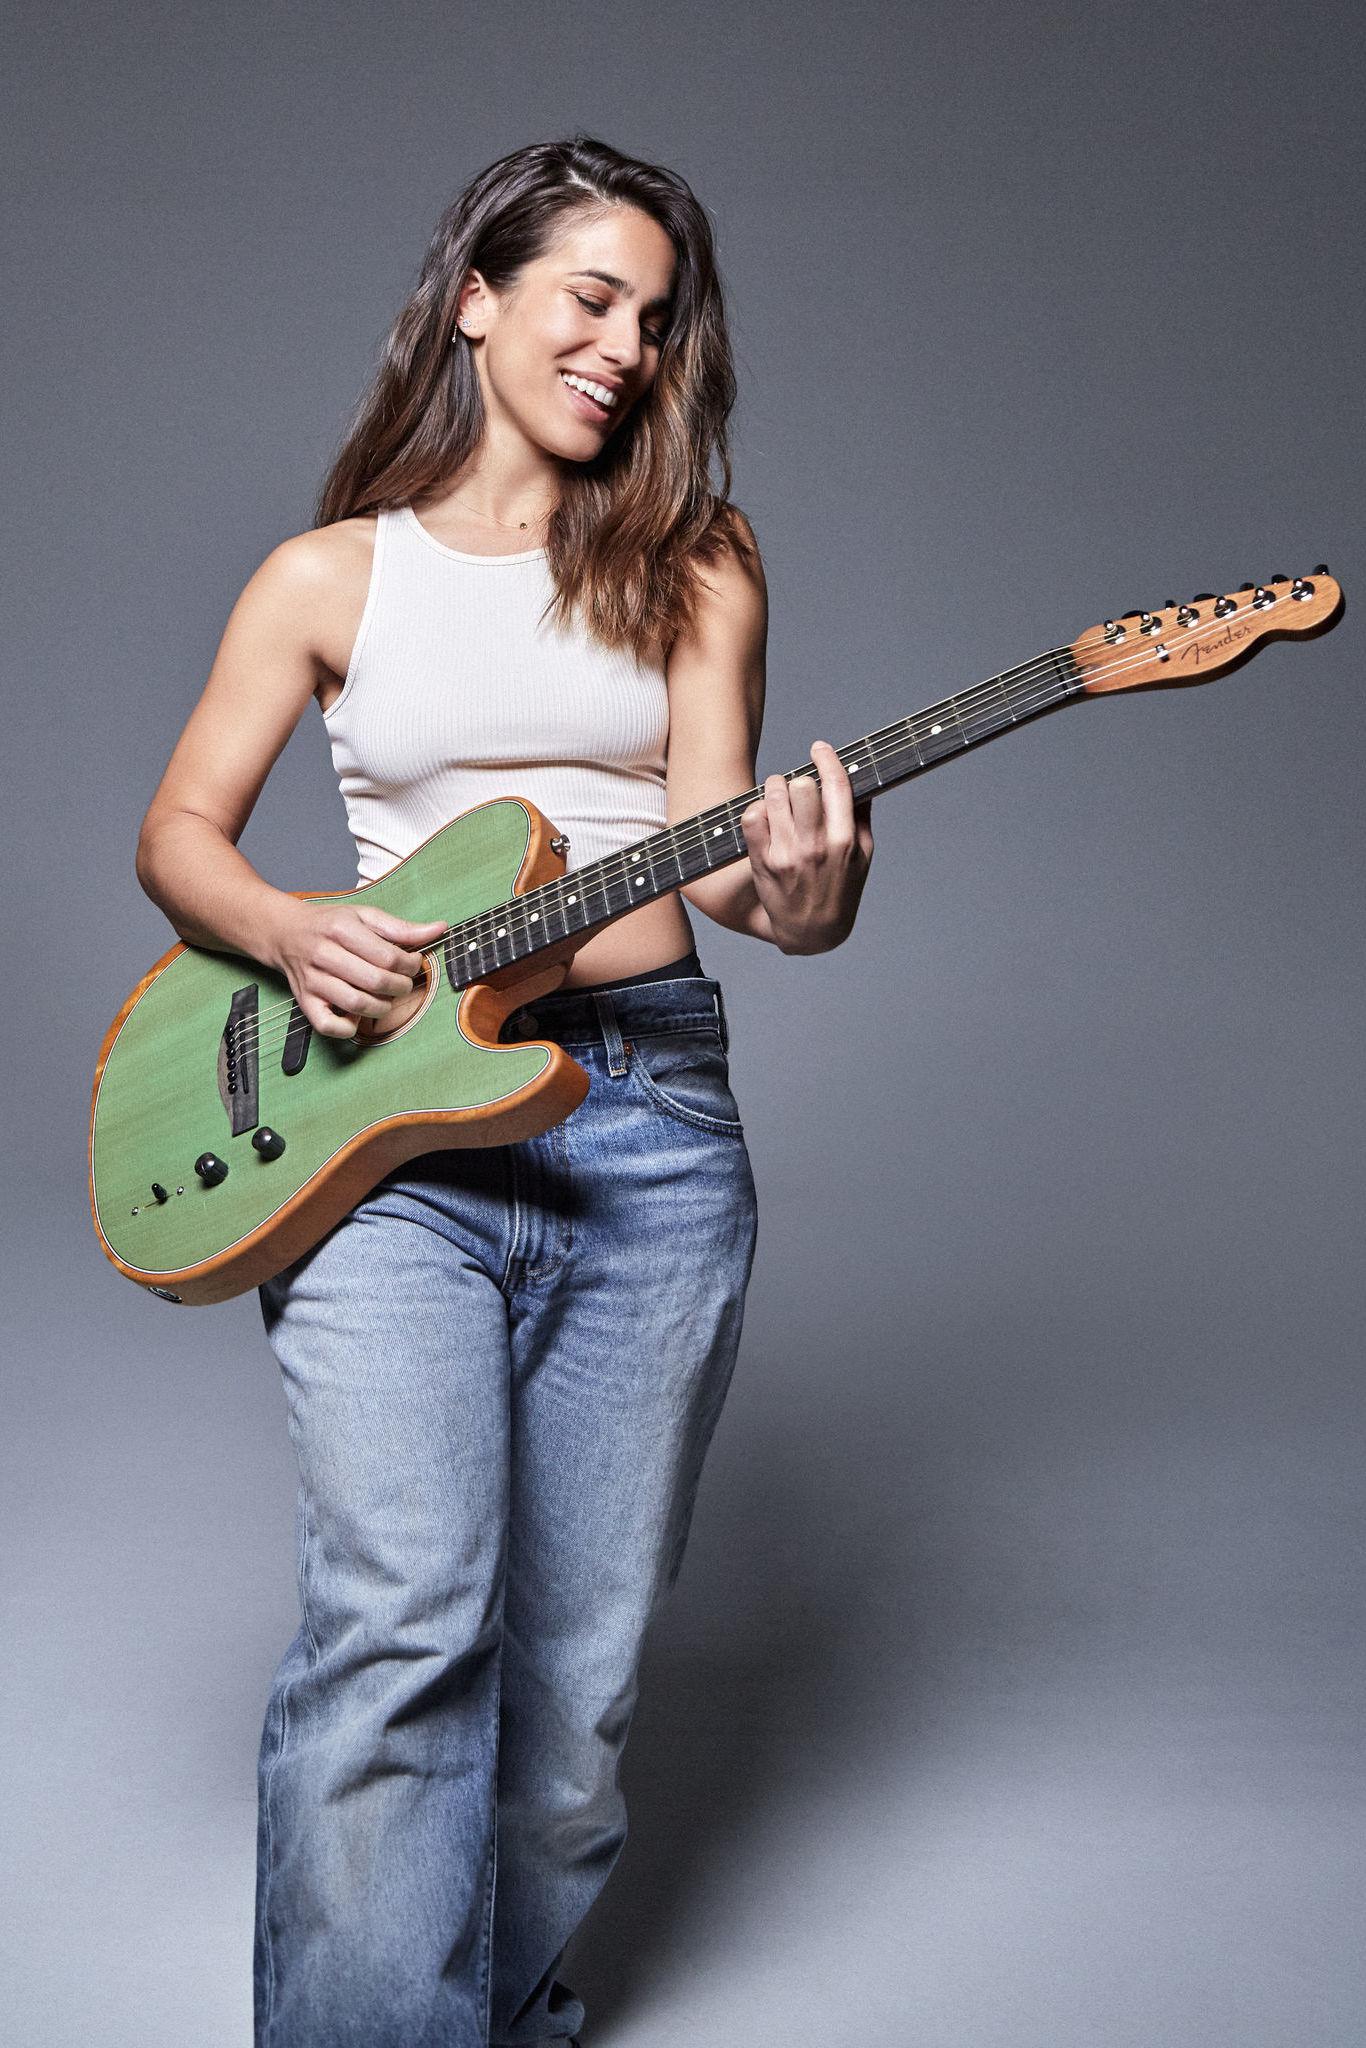 julia-medina-cantante-ot-segundo-disco-epicentro-071021-recorte.jpg